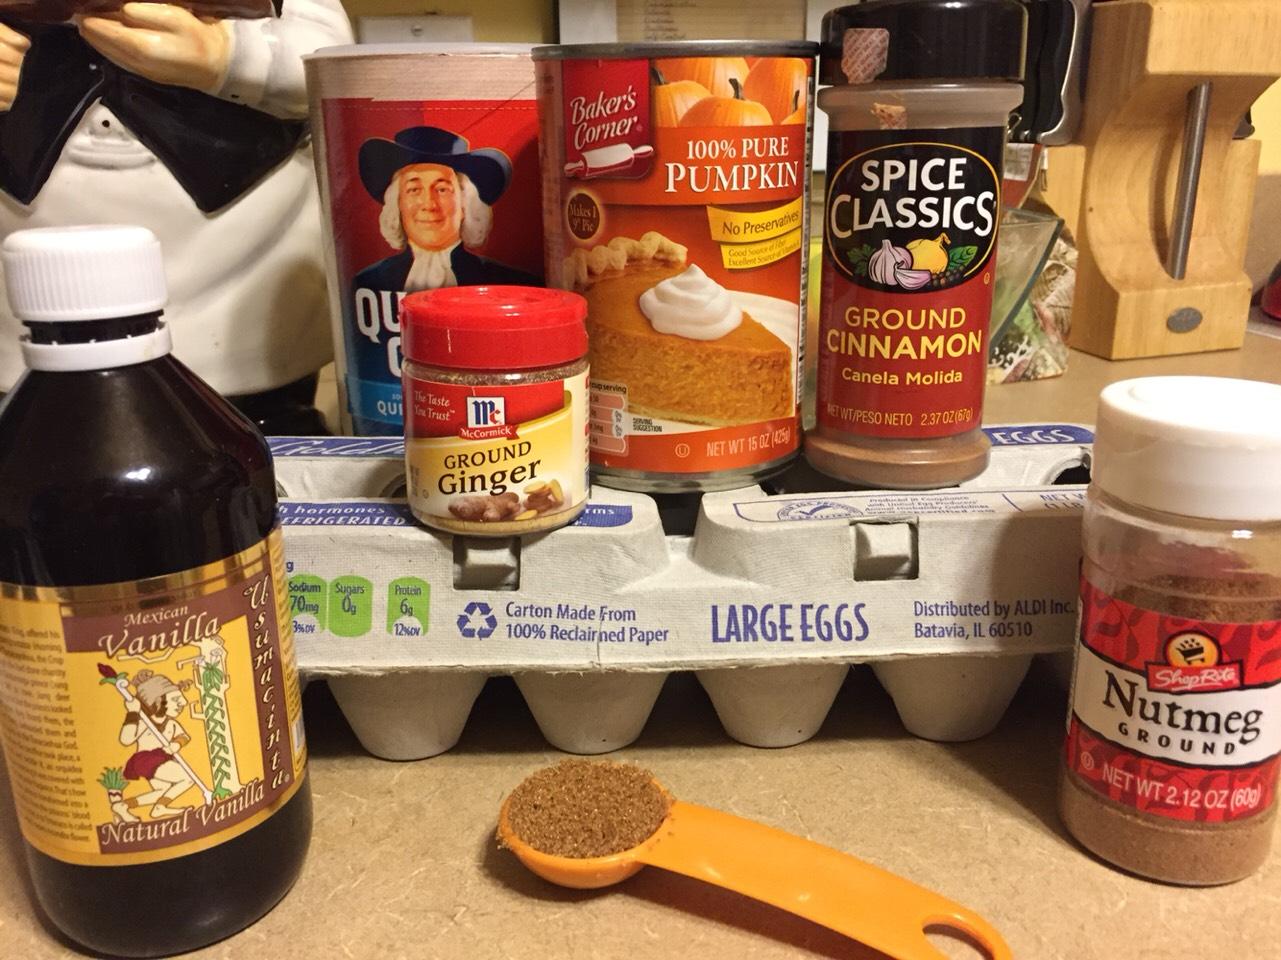 Ingredients: 1/2c quick oats 1/8tsp ground ginger 1/8tsp ground nutmeg 1/4tsp ground cinnamon 1/2TBSP brown sugar 1/2c canned pure pumpkin 1 egg 1/2tsp vanilla extract Nonstick spray